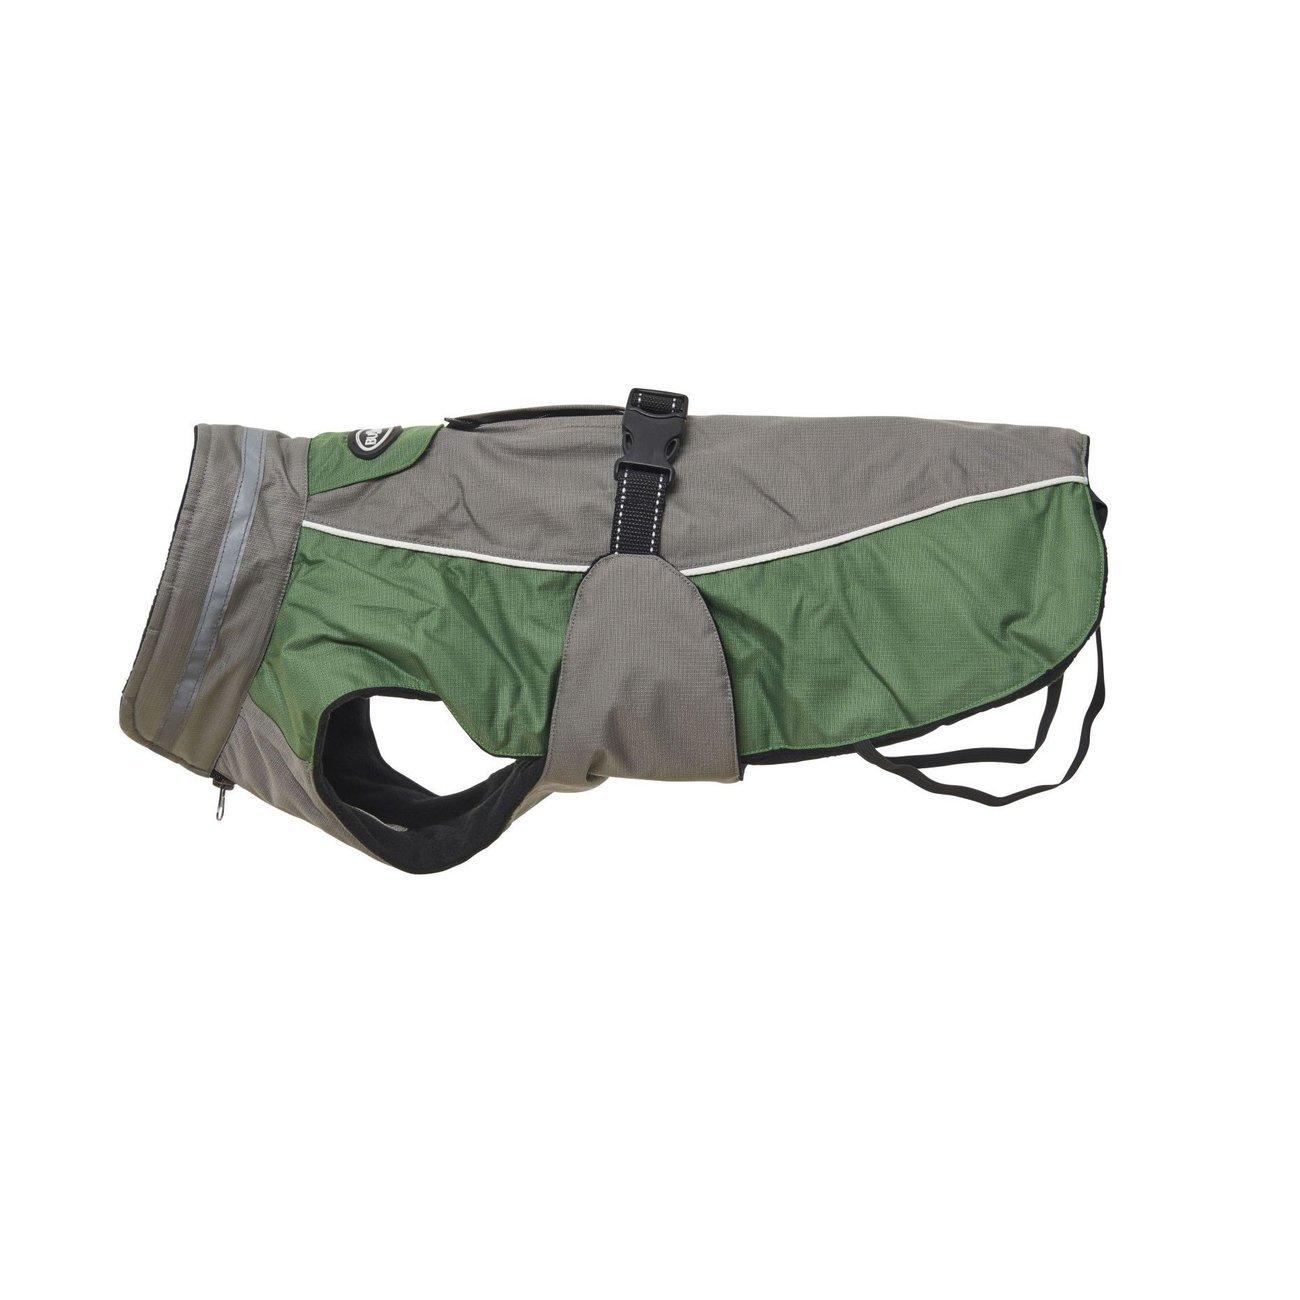 Buster Winterjacke für Hunde, XXL - grau/grün - Rücken 60 cm